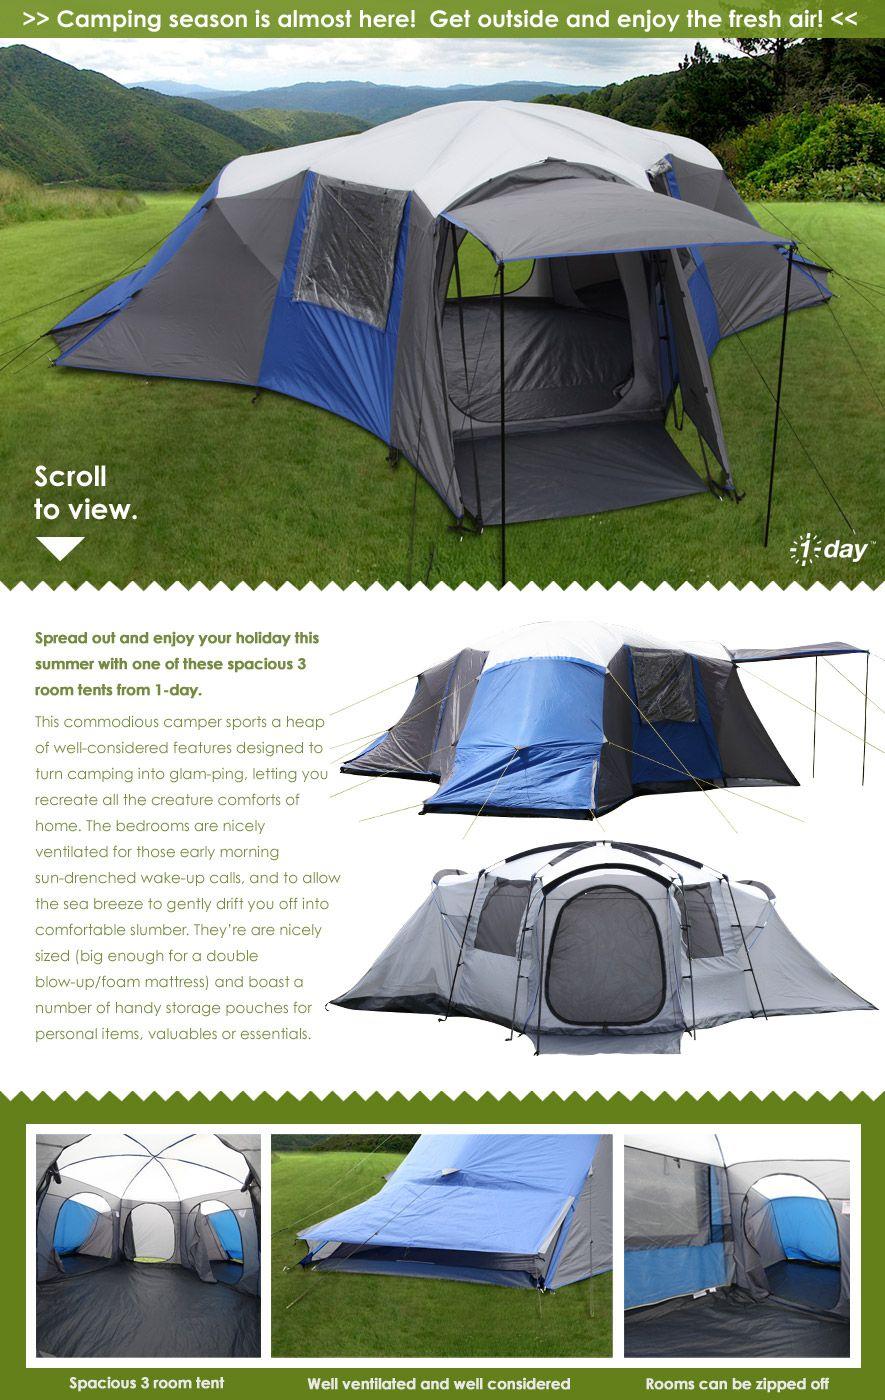 First Light Supreme 3 Room Tent  sc 1 st  Pinterest & First Light Supreme 3 Room Tent | Camping | Pinterest | Tents